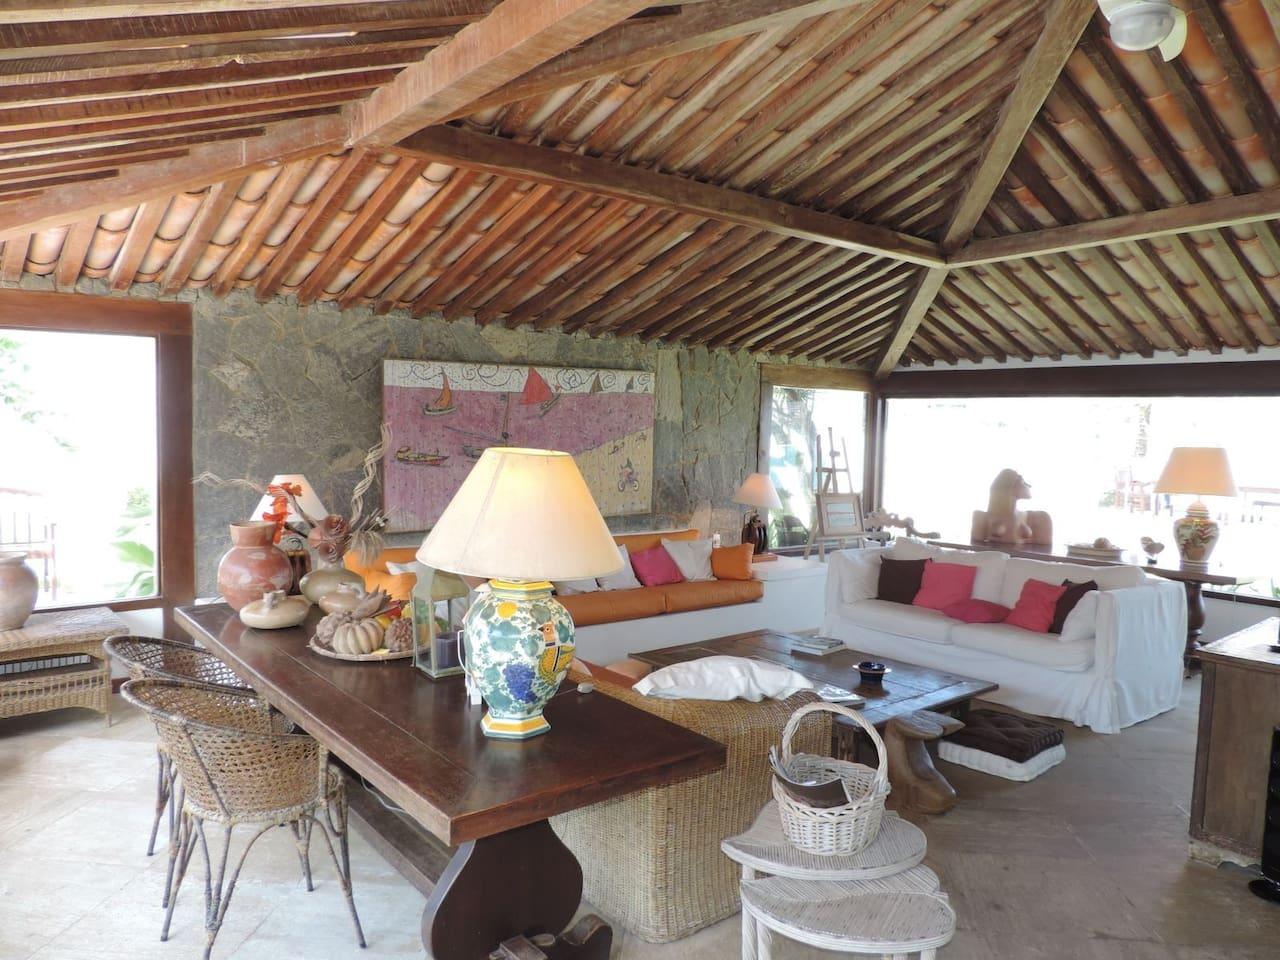 Casa Rústica na Praia da Ferradura, em Búzios